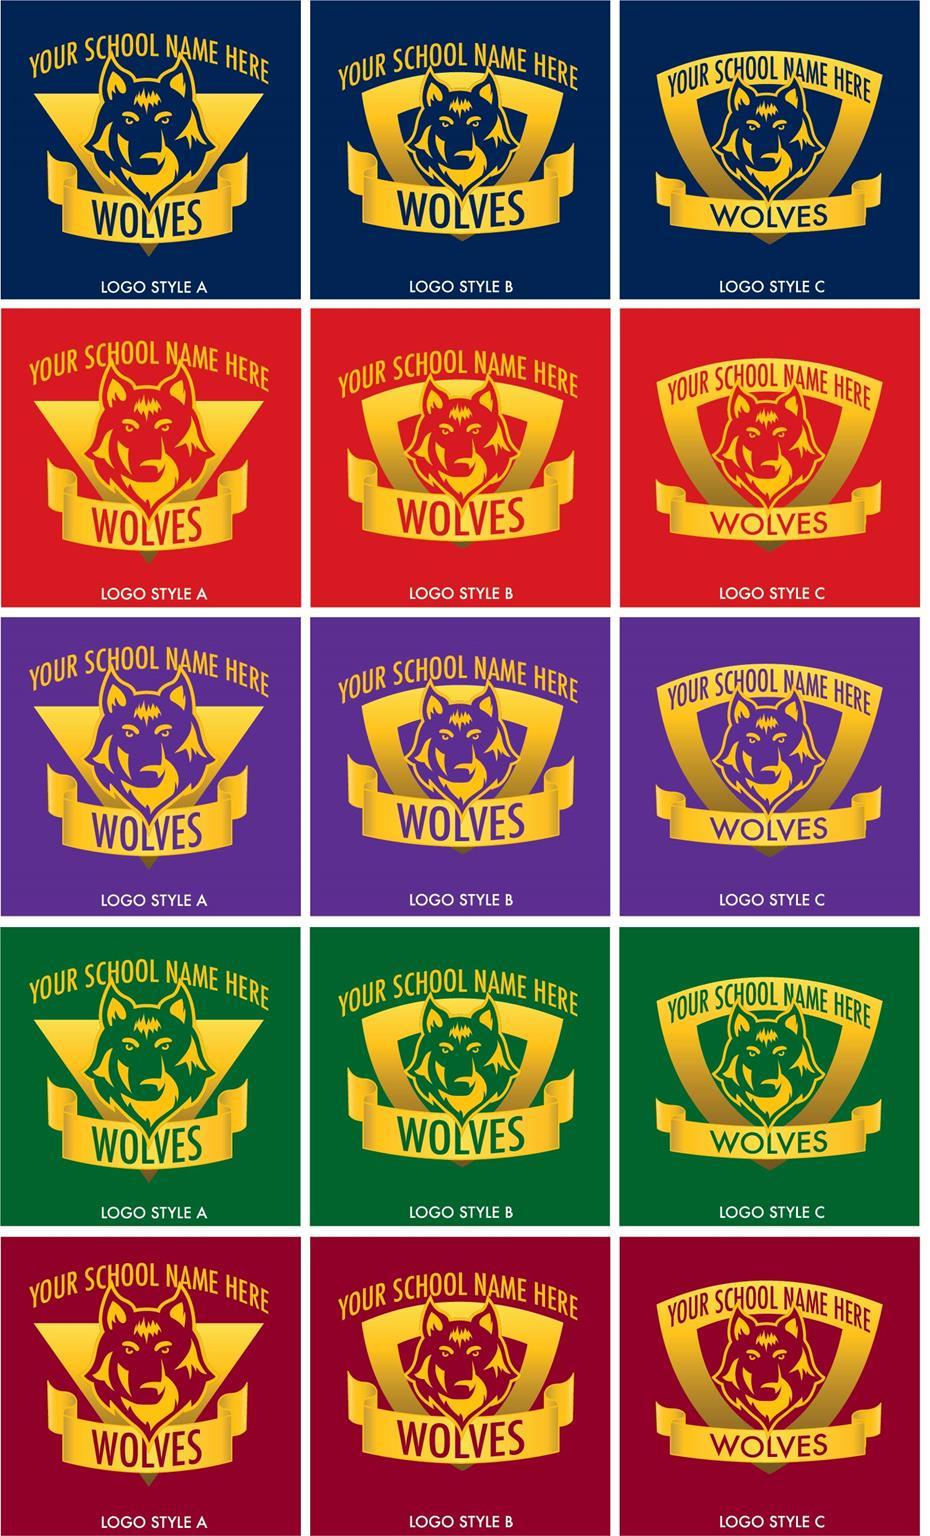 Wolf Mascot Logo School